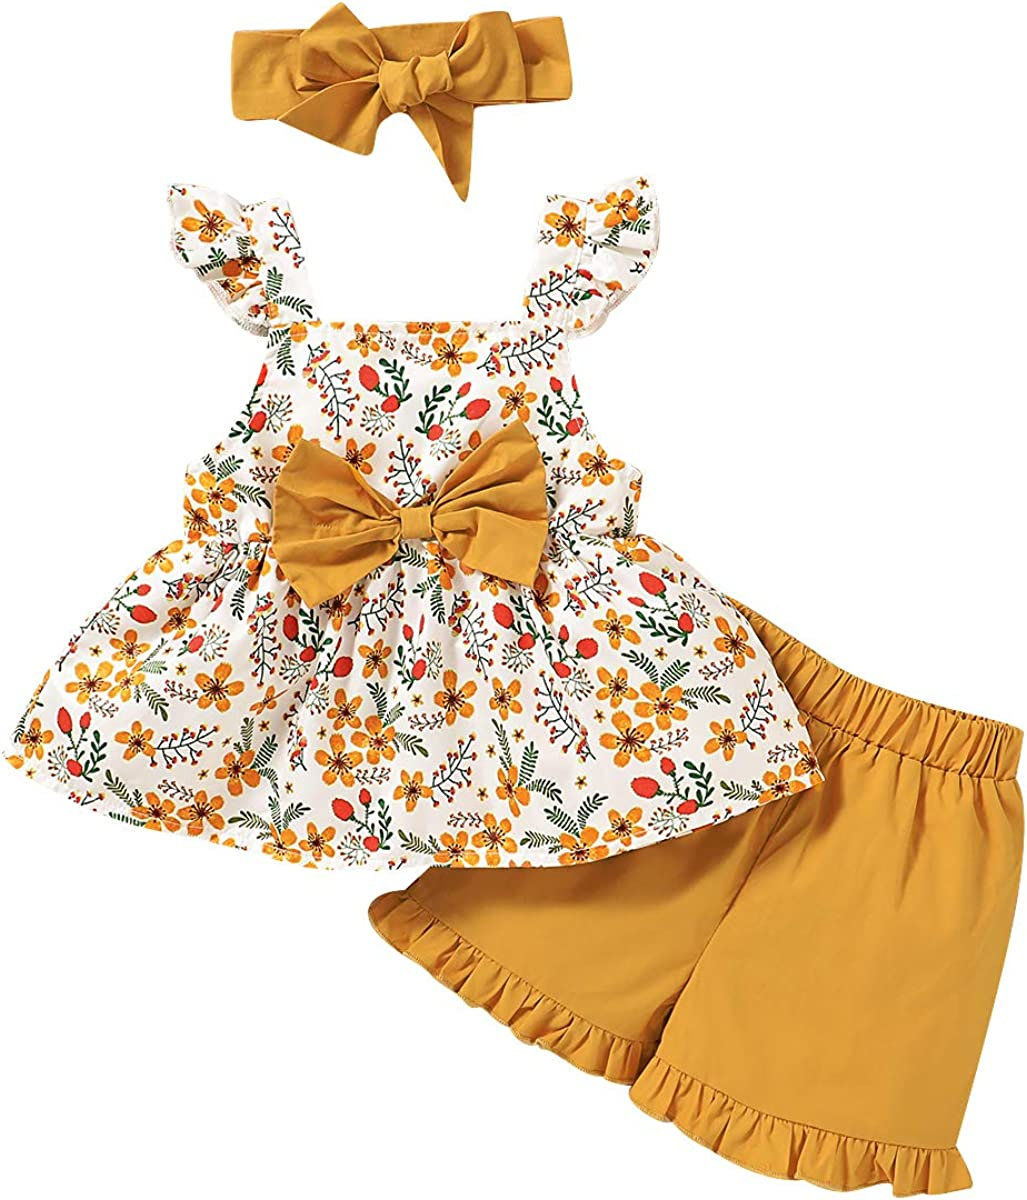 3PCS Toddler Baby Girl Summer Outfits Flower Strap Crop Tops + Short Pants+Cute Headband Clothes Set